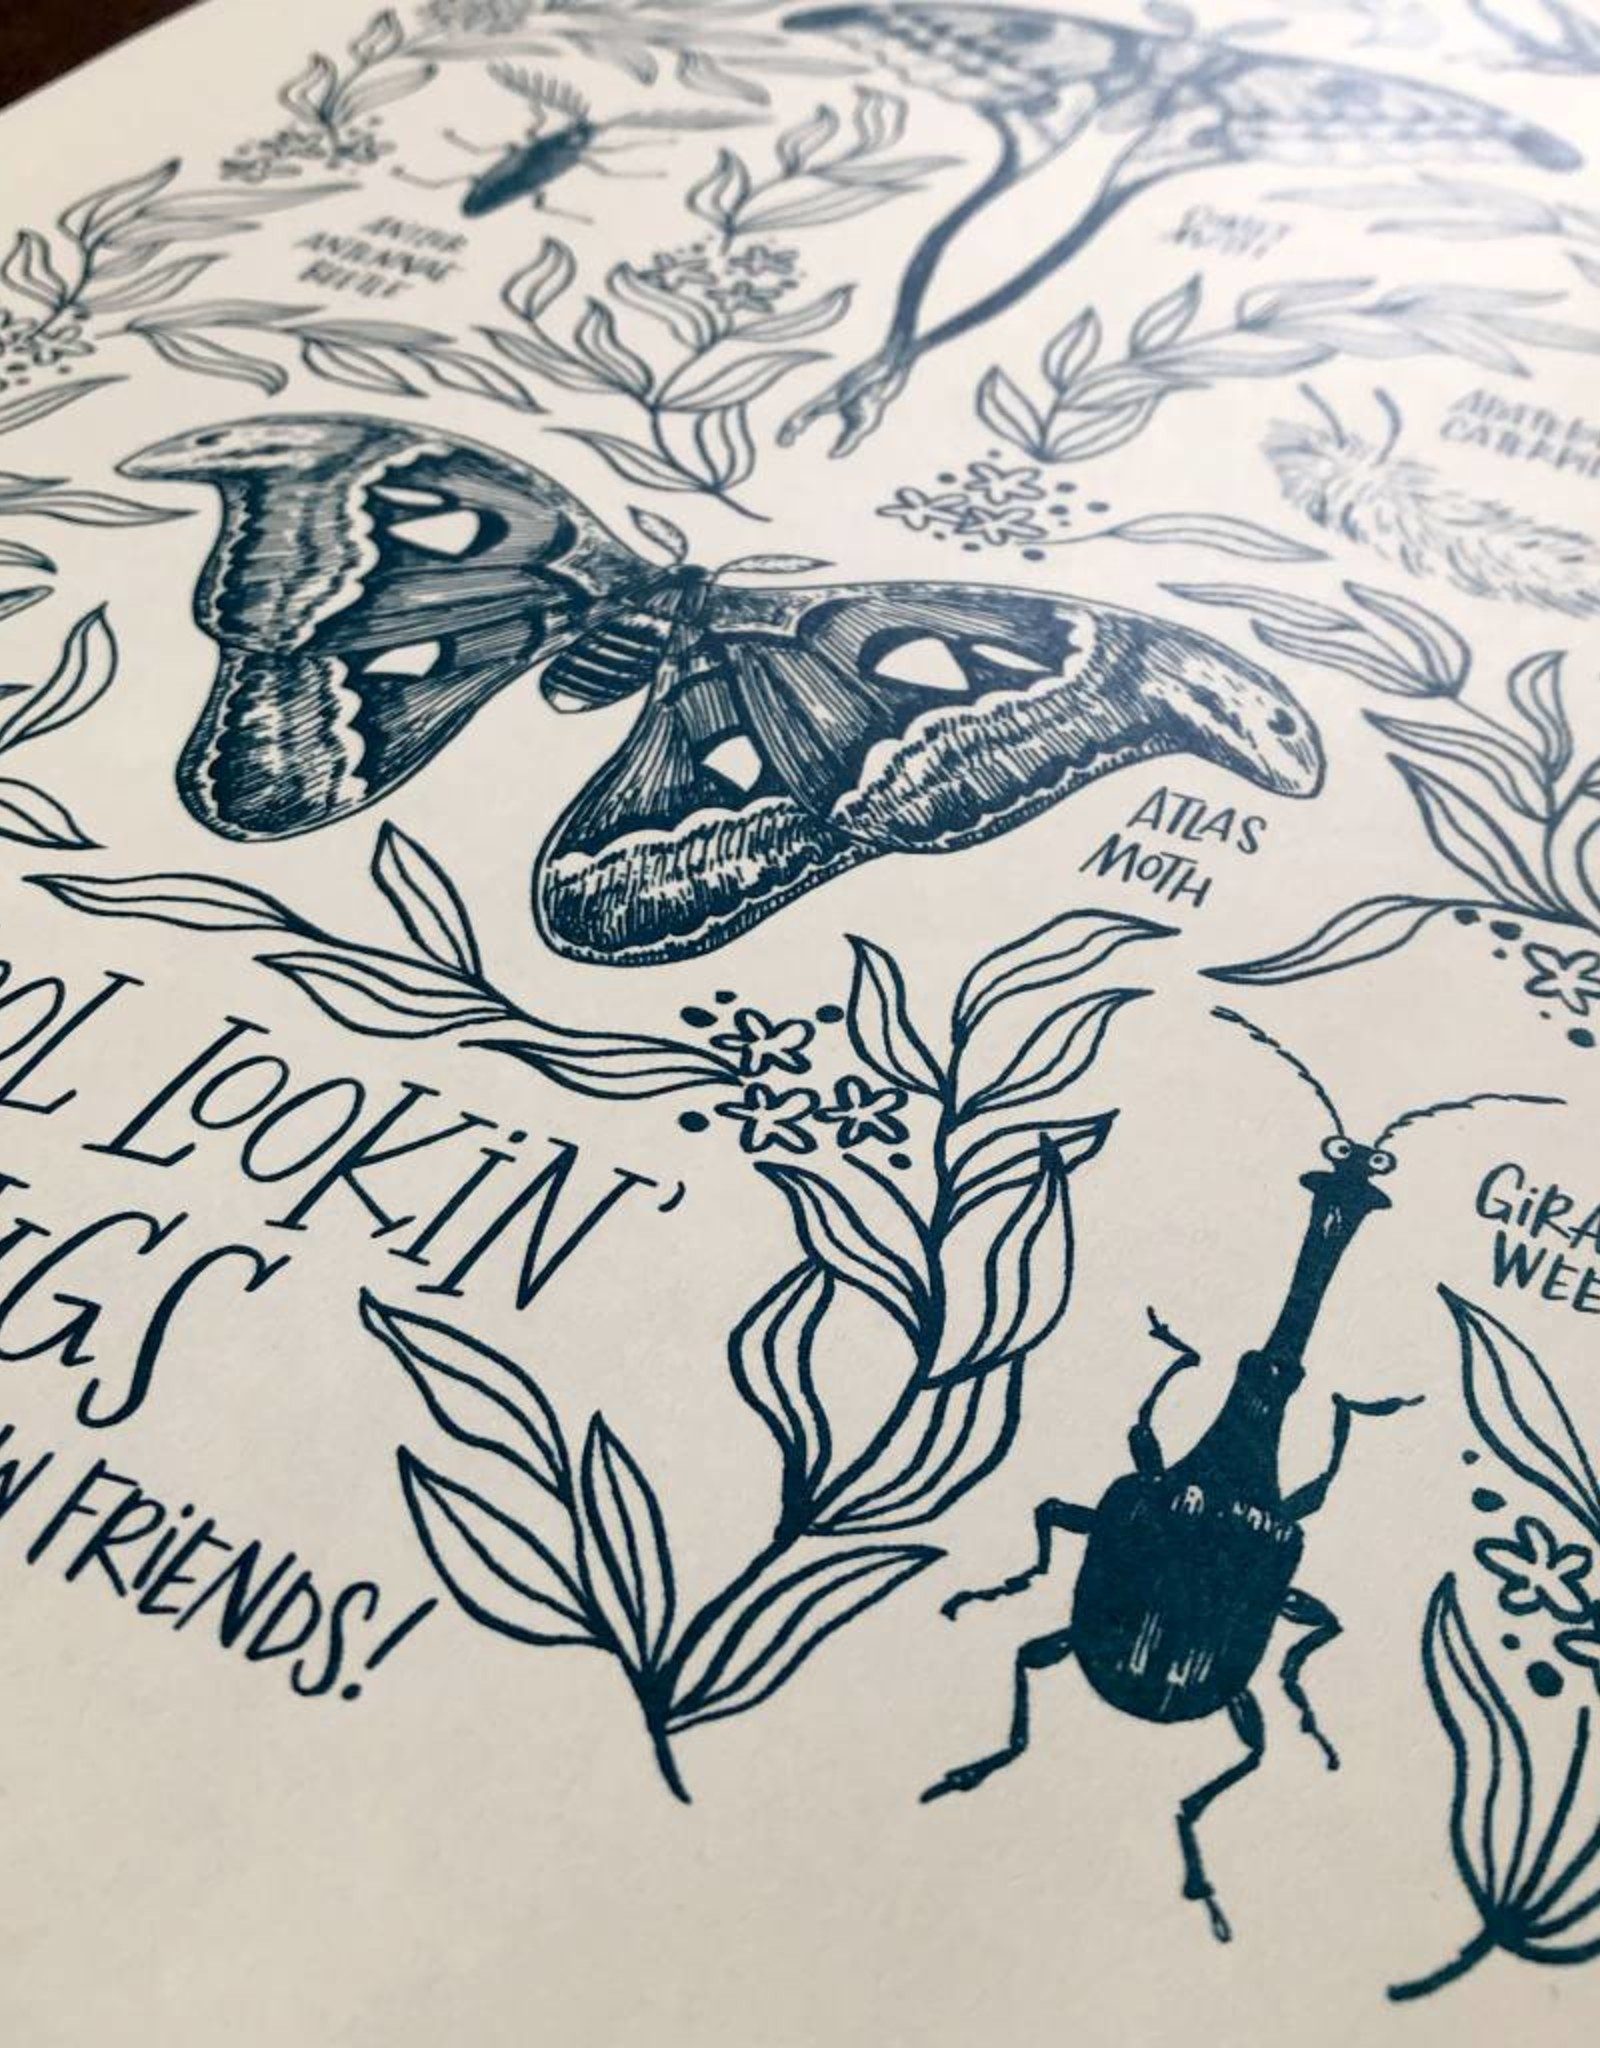 Frog & Toad Press Cool Lookin' Bugs Print